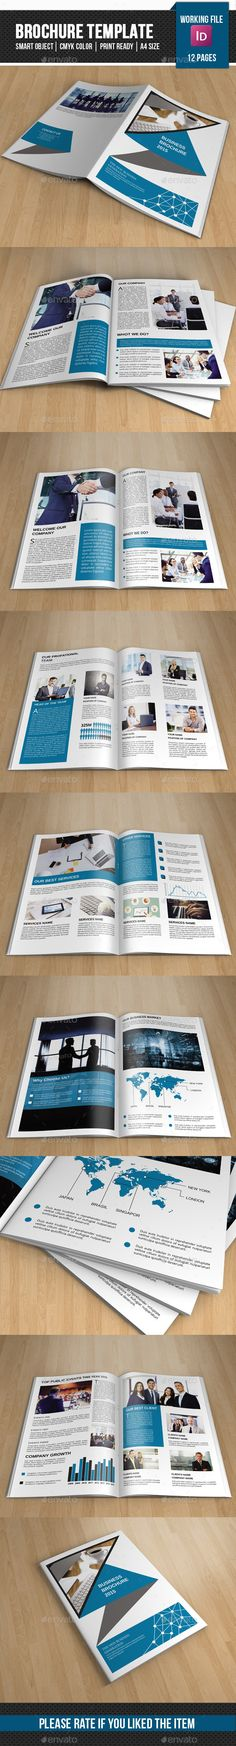 Corporate Brochure Template Design #brochure Download: http://graphicriver.net/item/corporate-brochure-templatev246/11453839?ref=ksioks